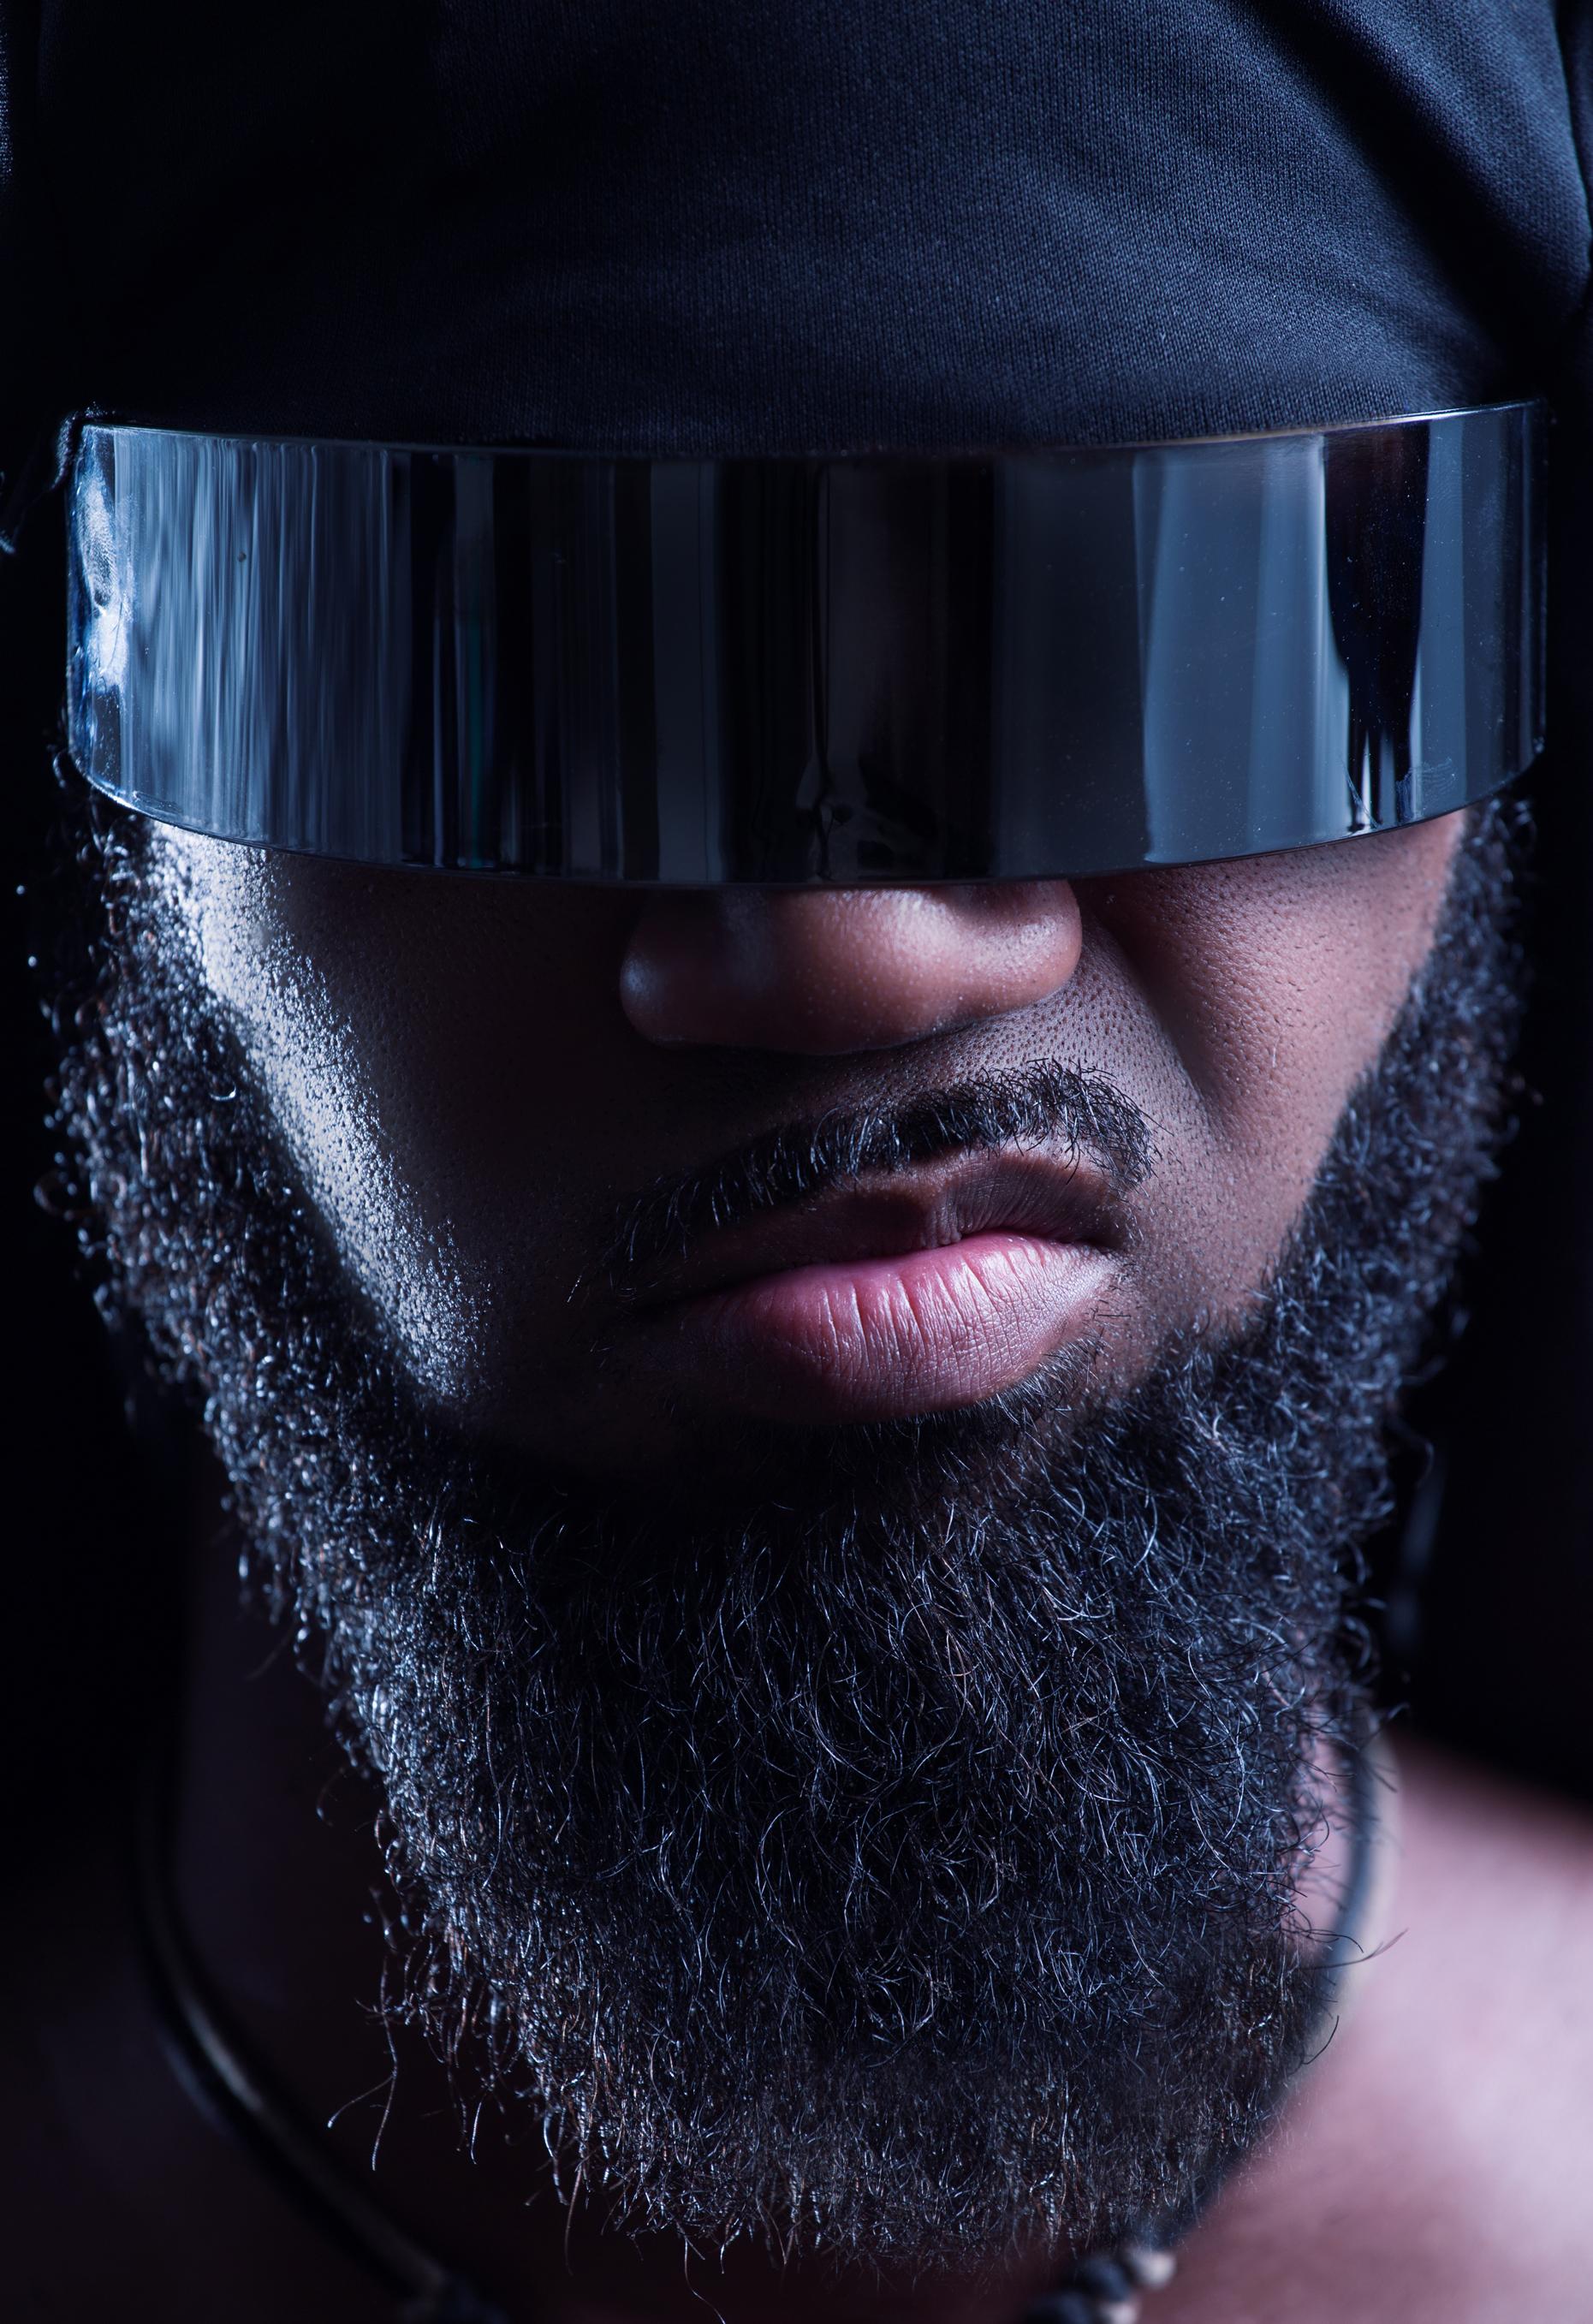 Sci Fi visor photo shoot